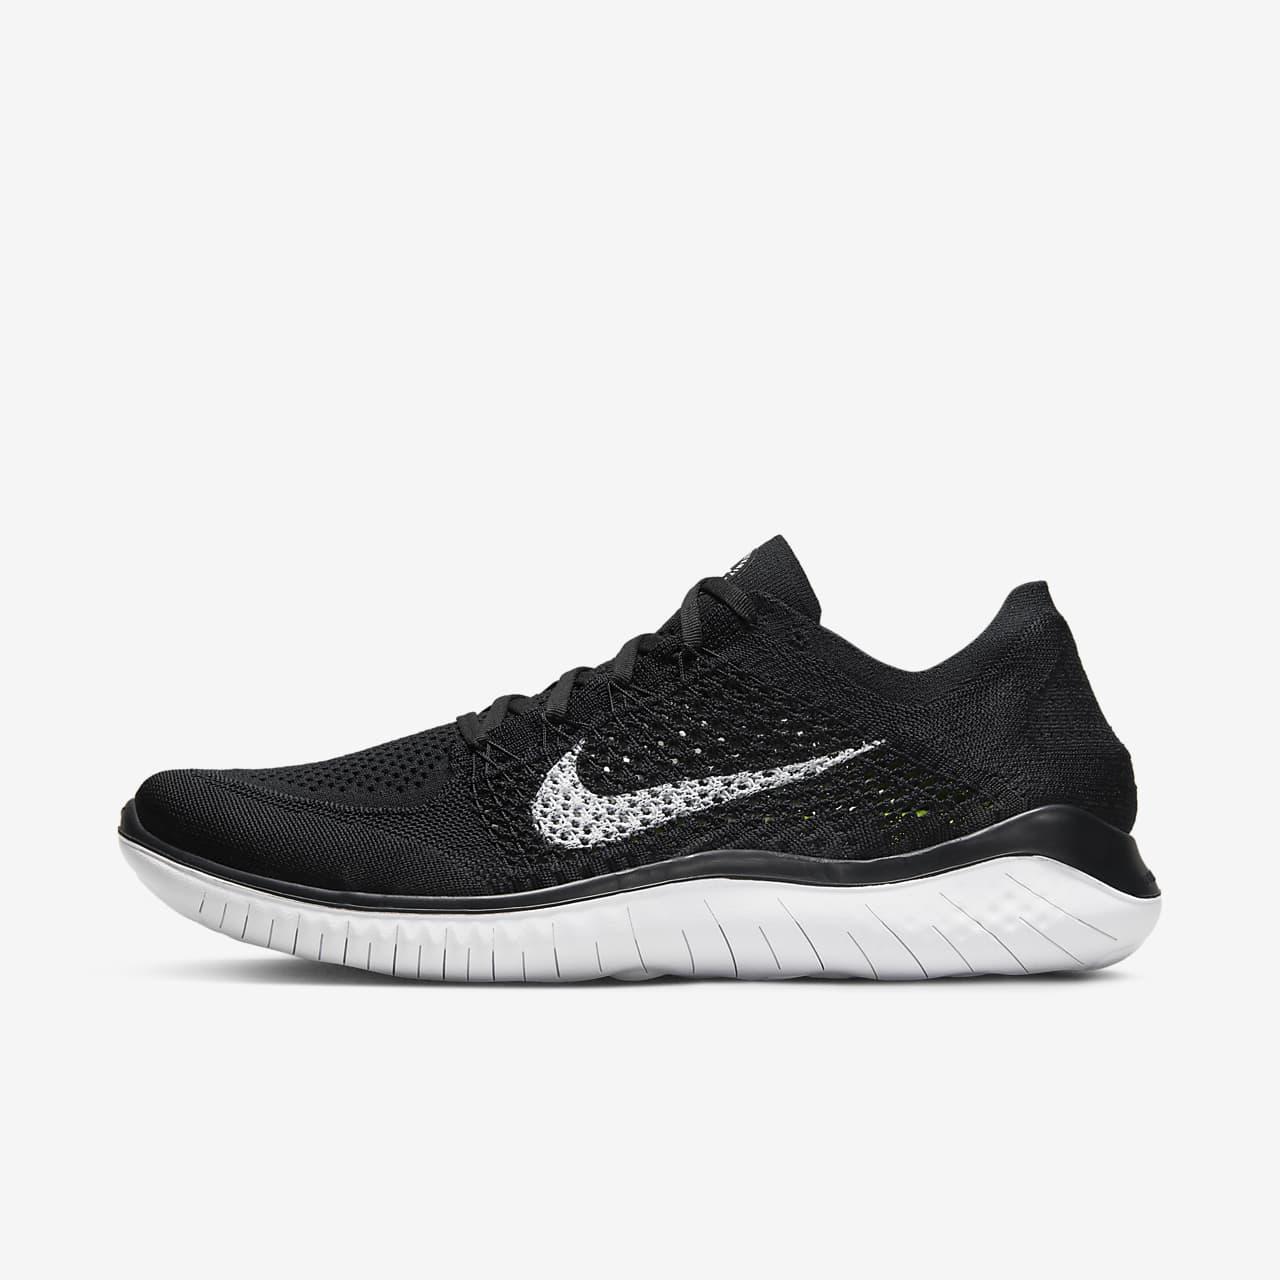 ... Scarpa da running Nike Free RN Flyknit 2018 - Uomo